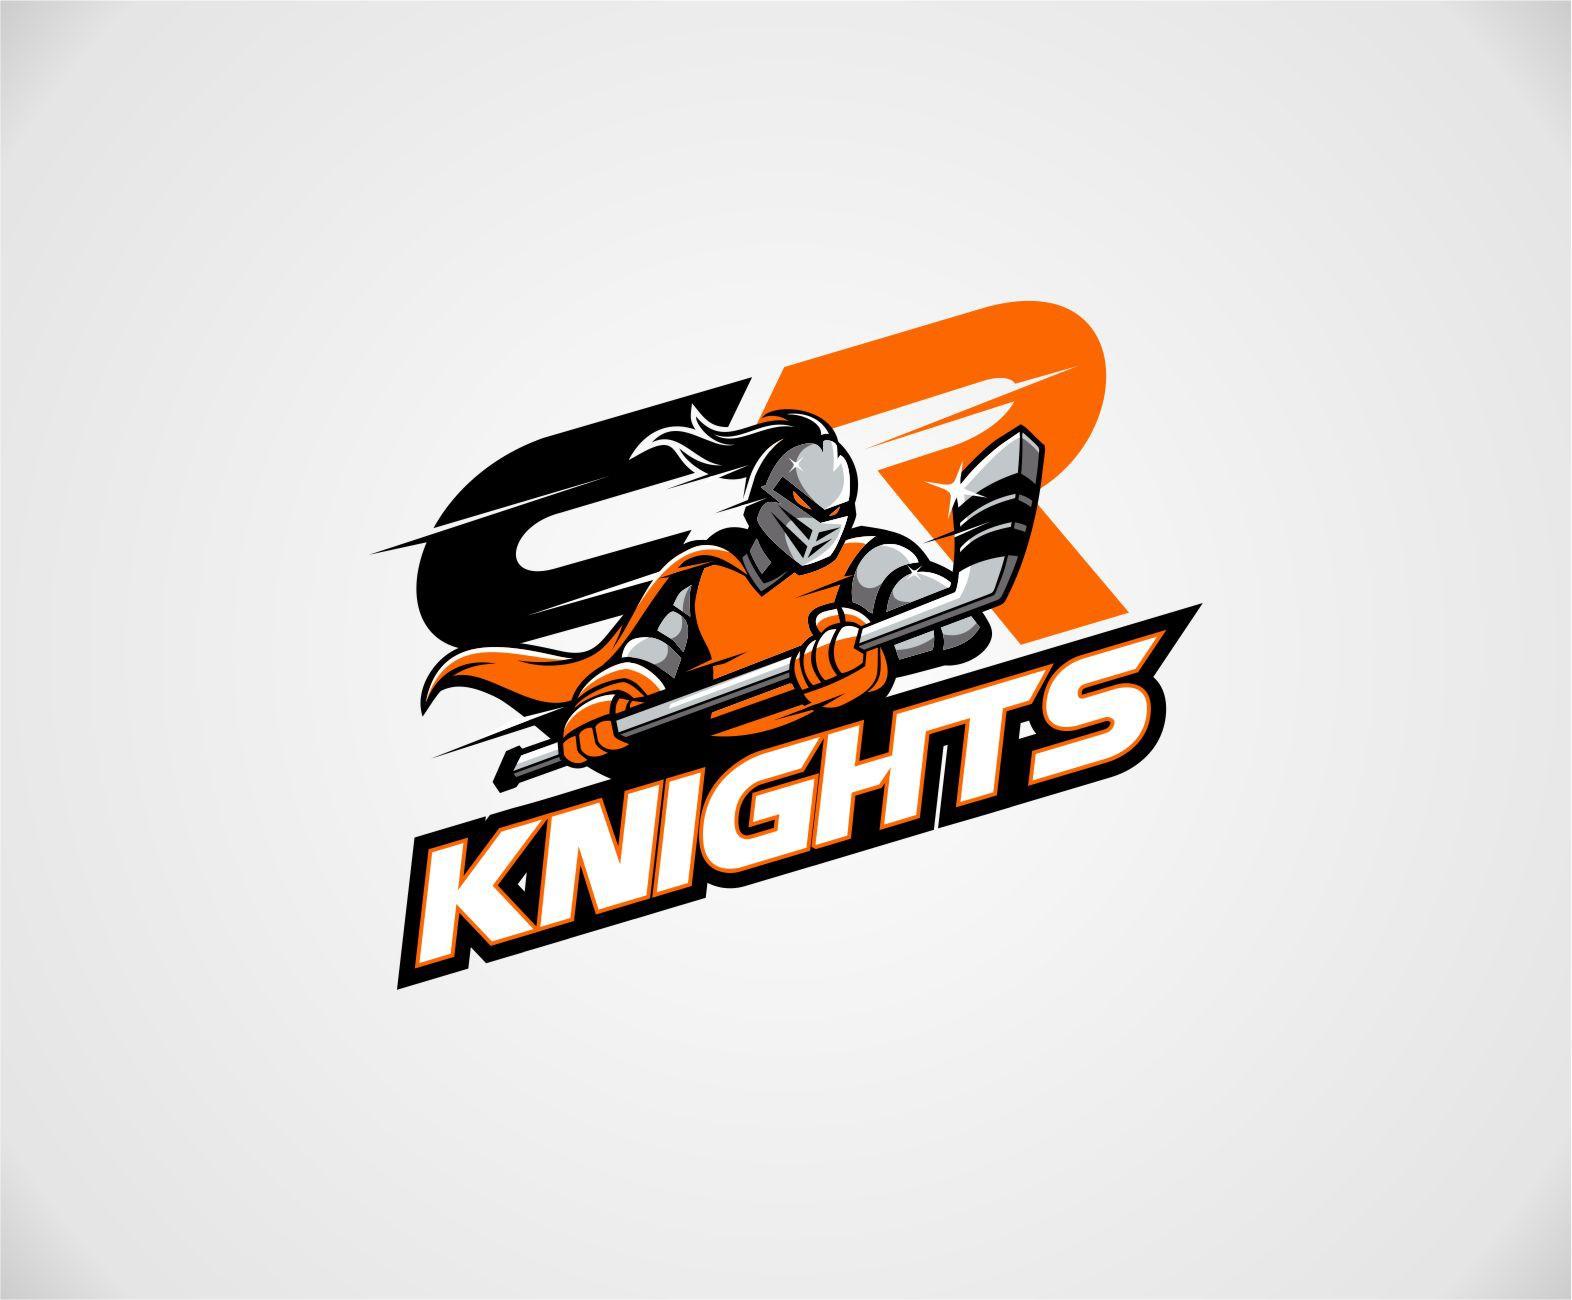 Help create a unique new sports logo for a hockey association